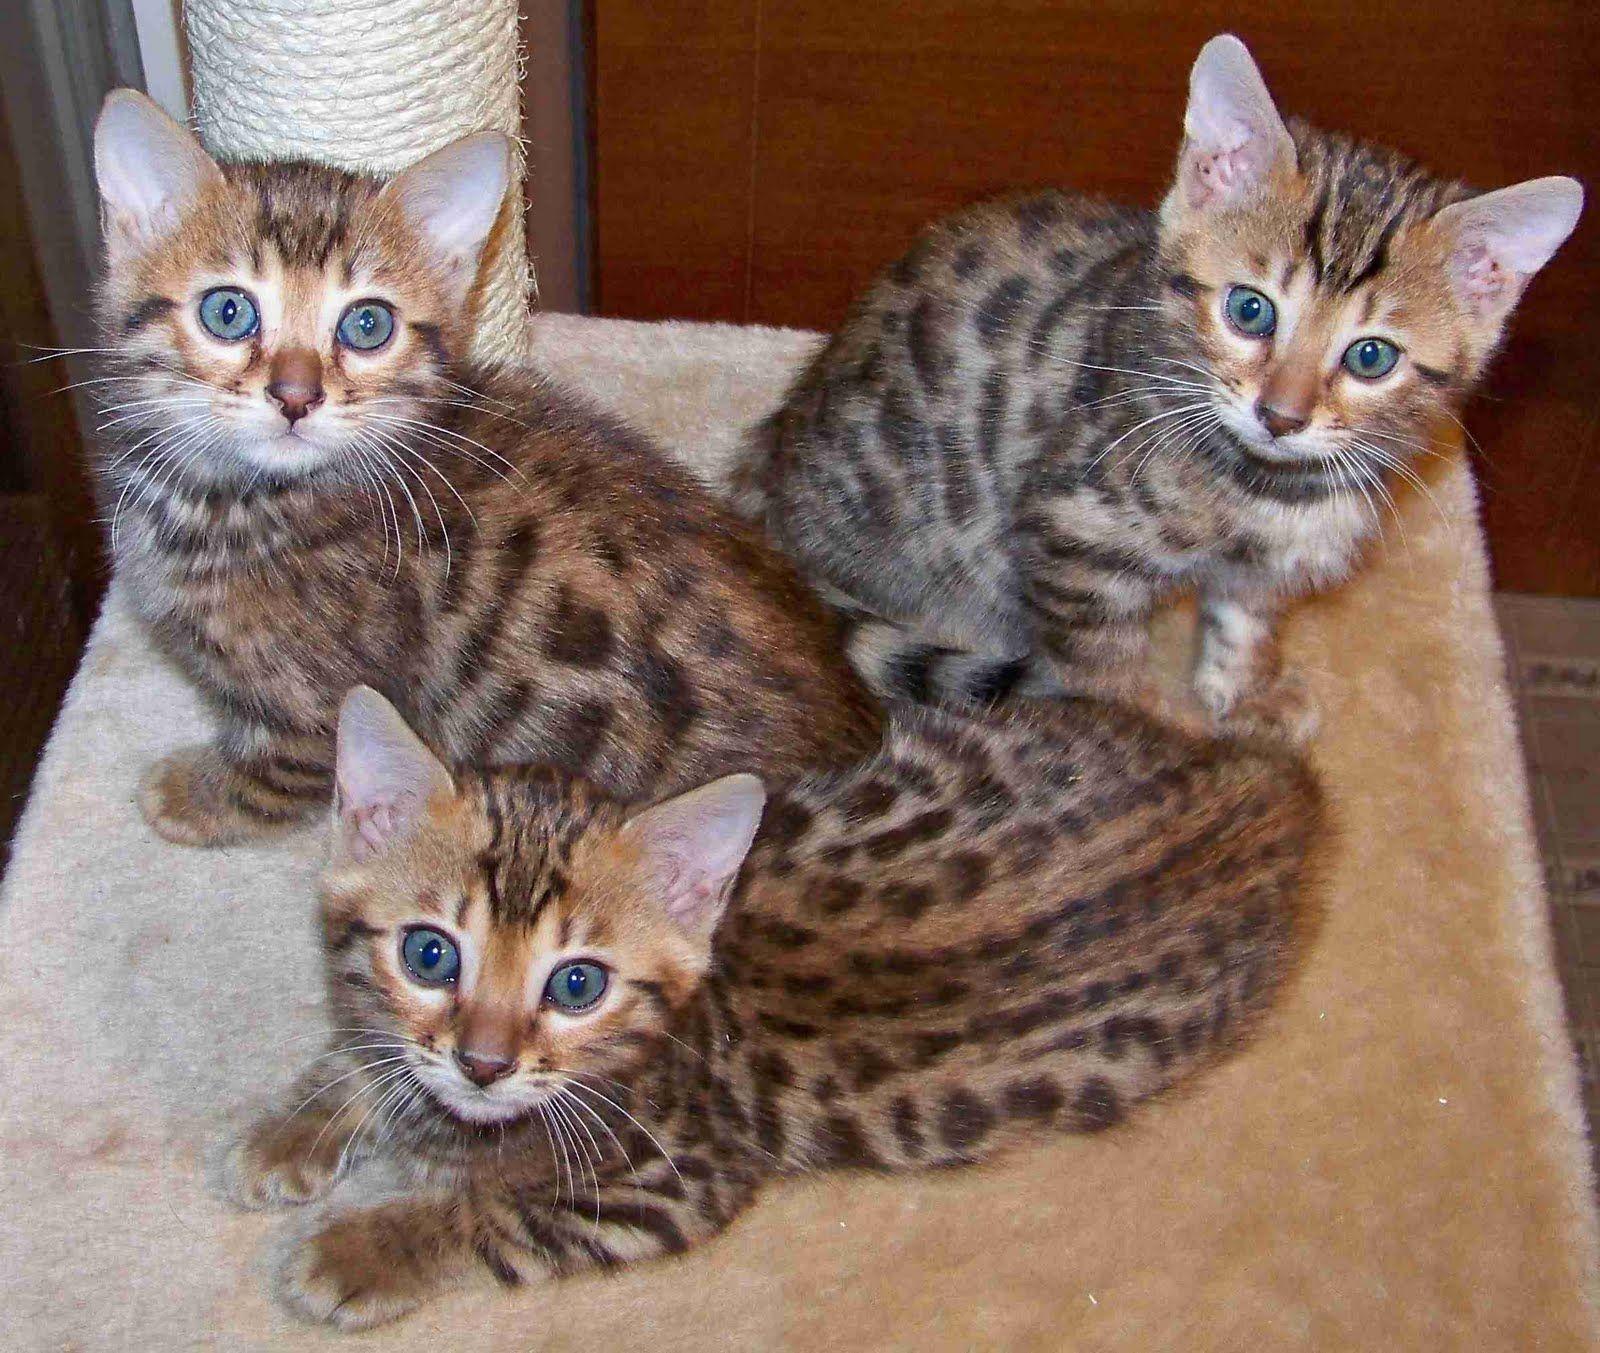 need, now. Bengal kitten!! <3